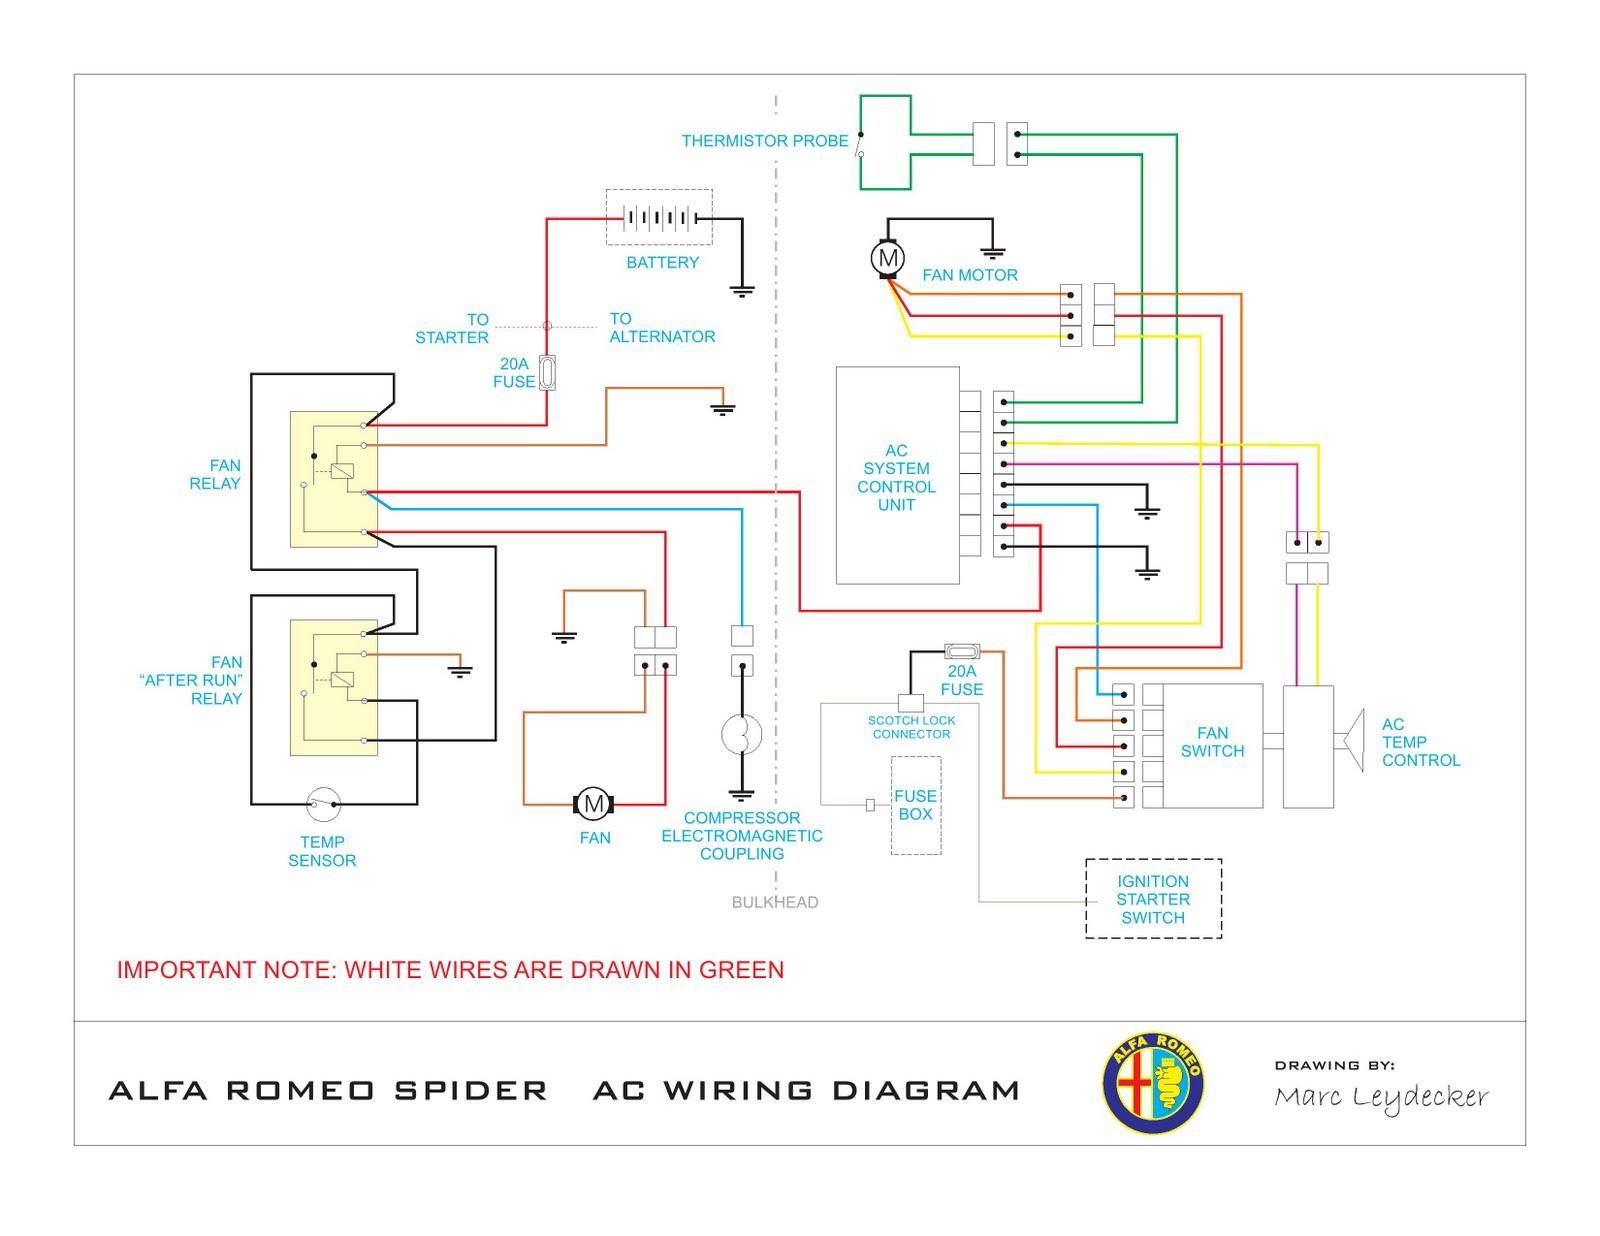 1991 Jeep Wrangler Alternator Wiring Diagram Schematic July 2011 Schematic Wiring Diagrams Solutions